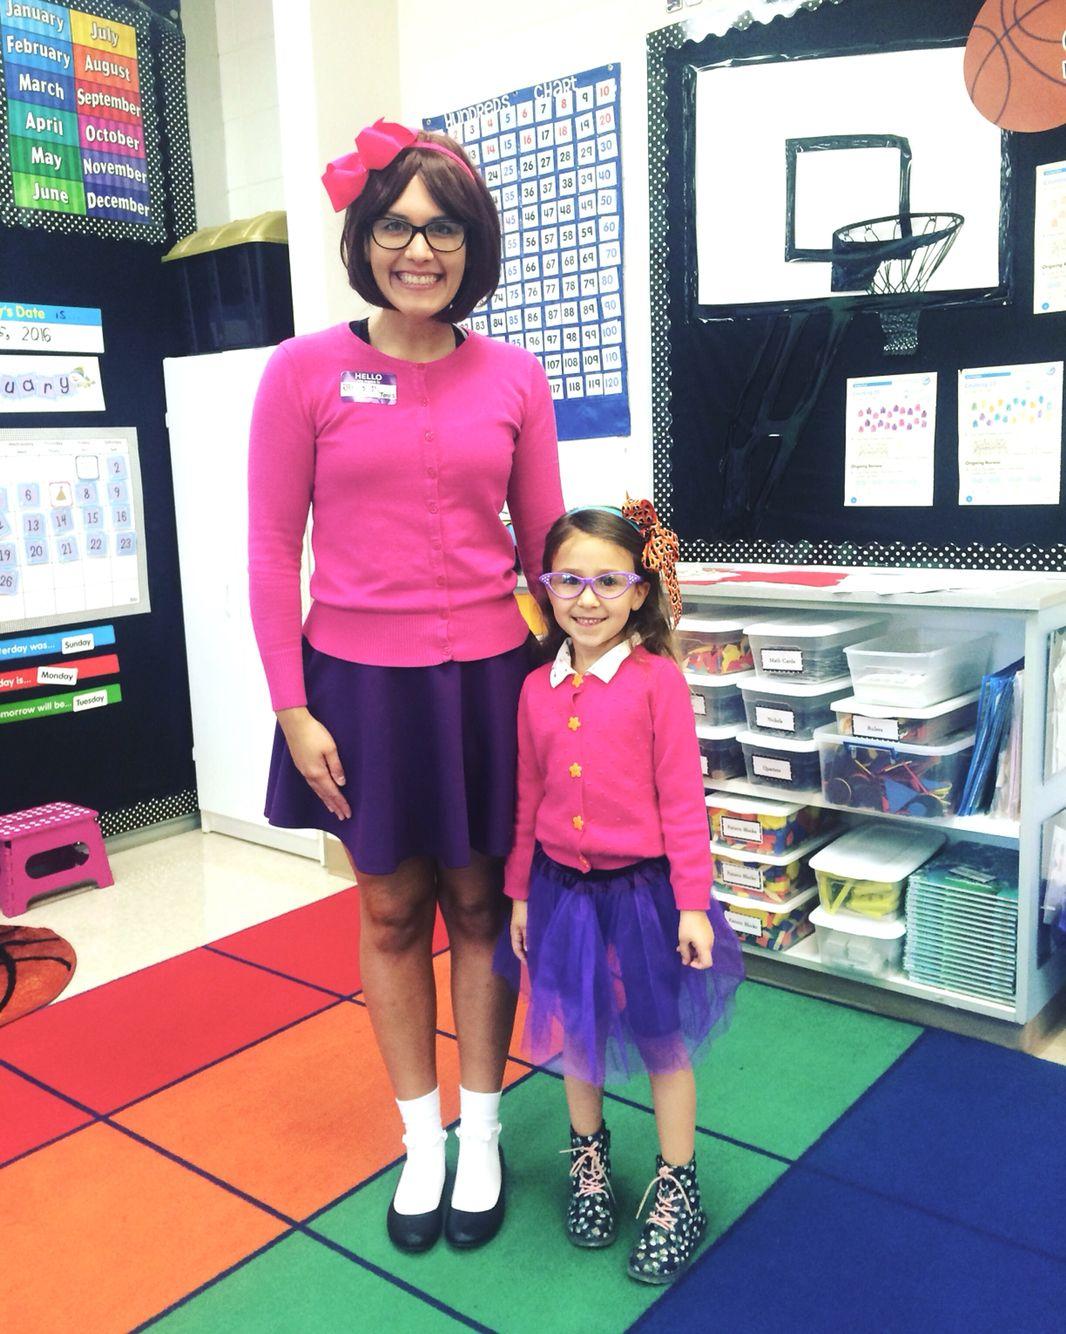 Junie B Jones Costume For Student And Teacher